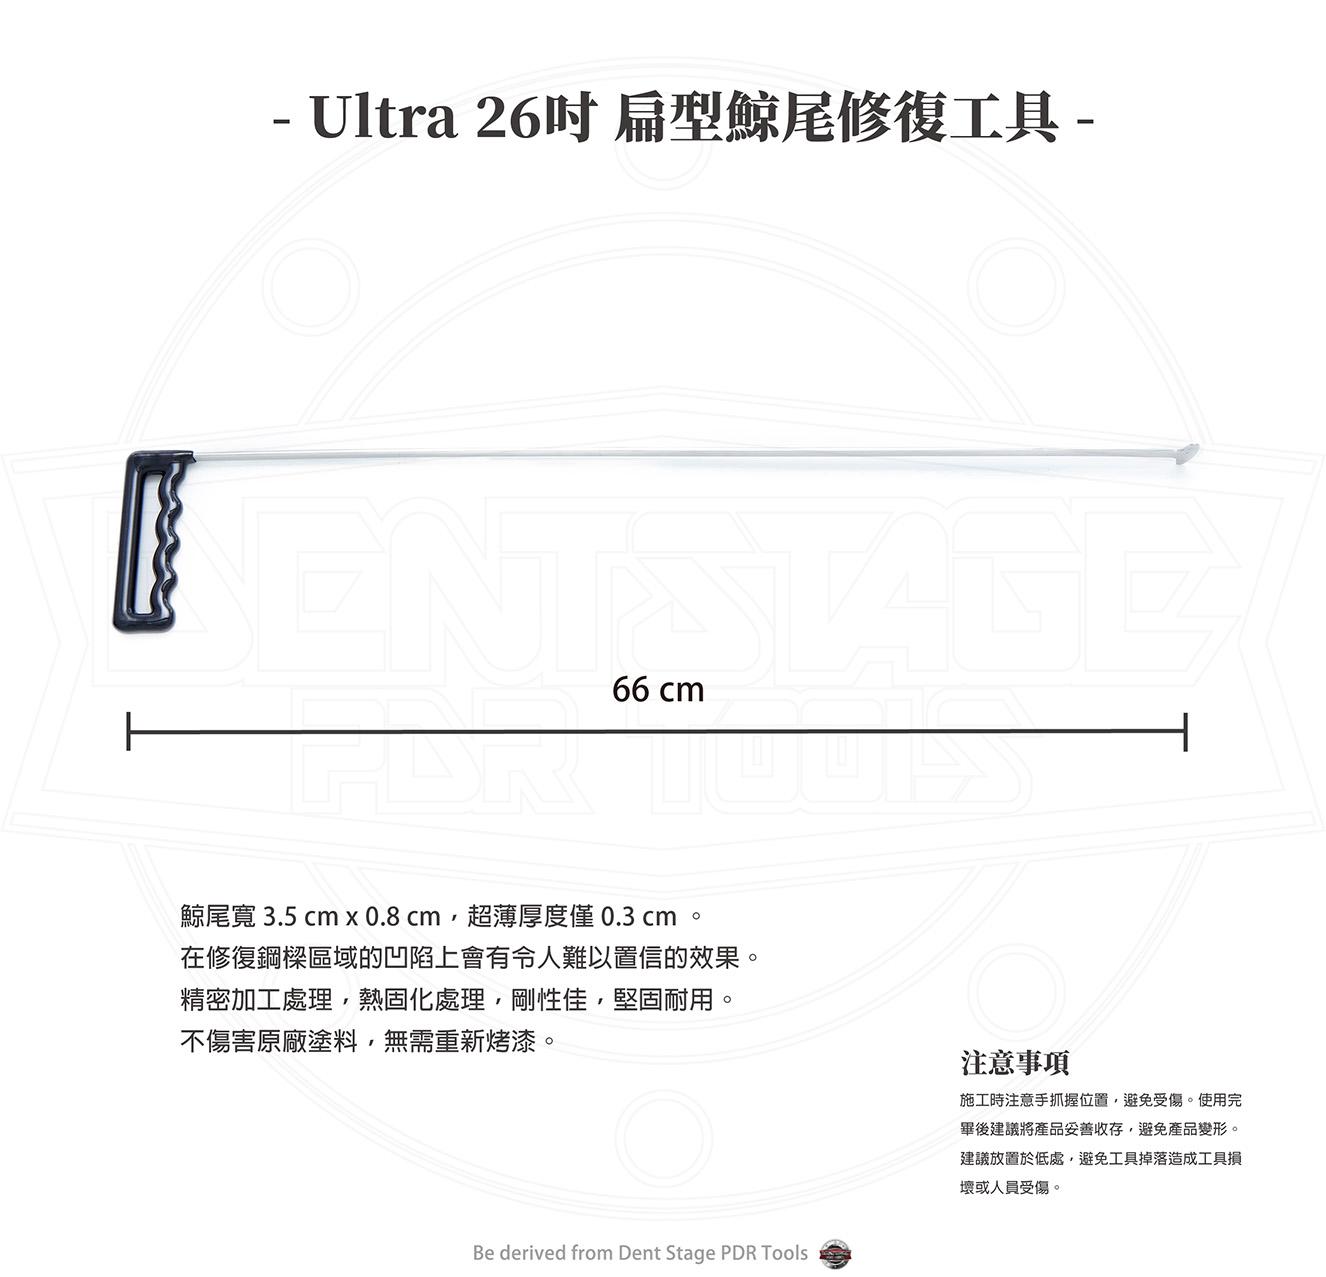 Ultra 26吋 扁型鯨尾修復工具_02.jpg